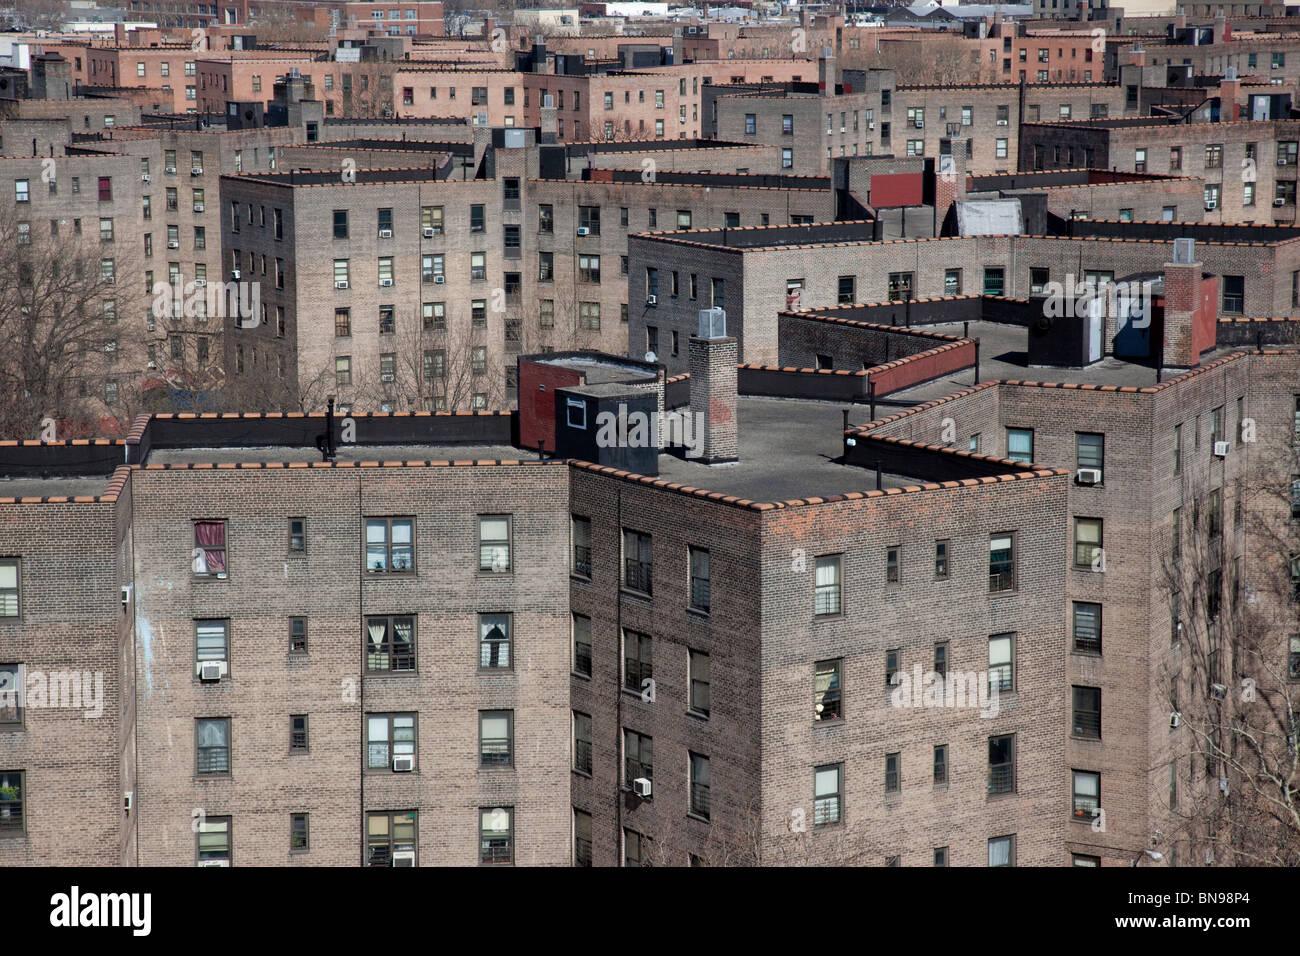 Projekte in Long Island City, Queens, New York Stockfoto, Bild ...